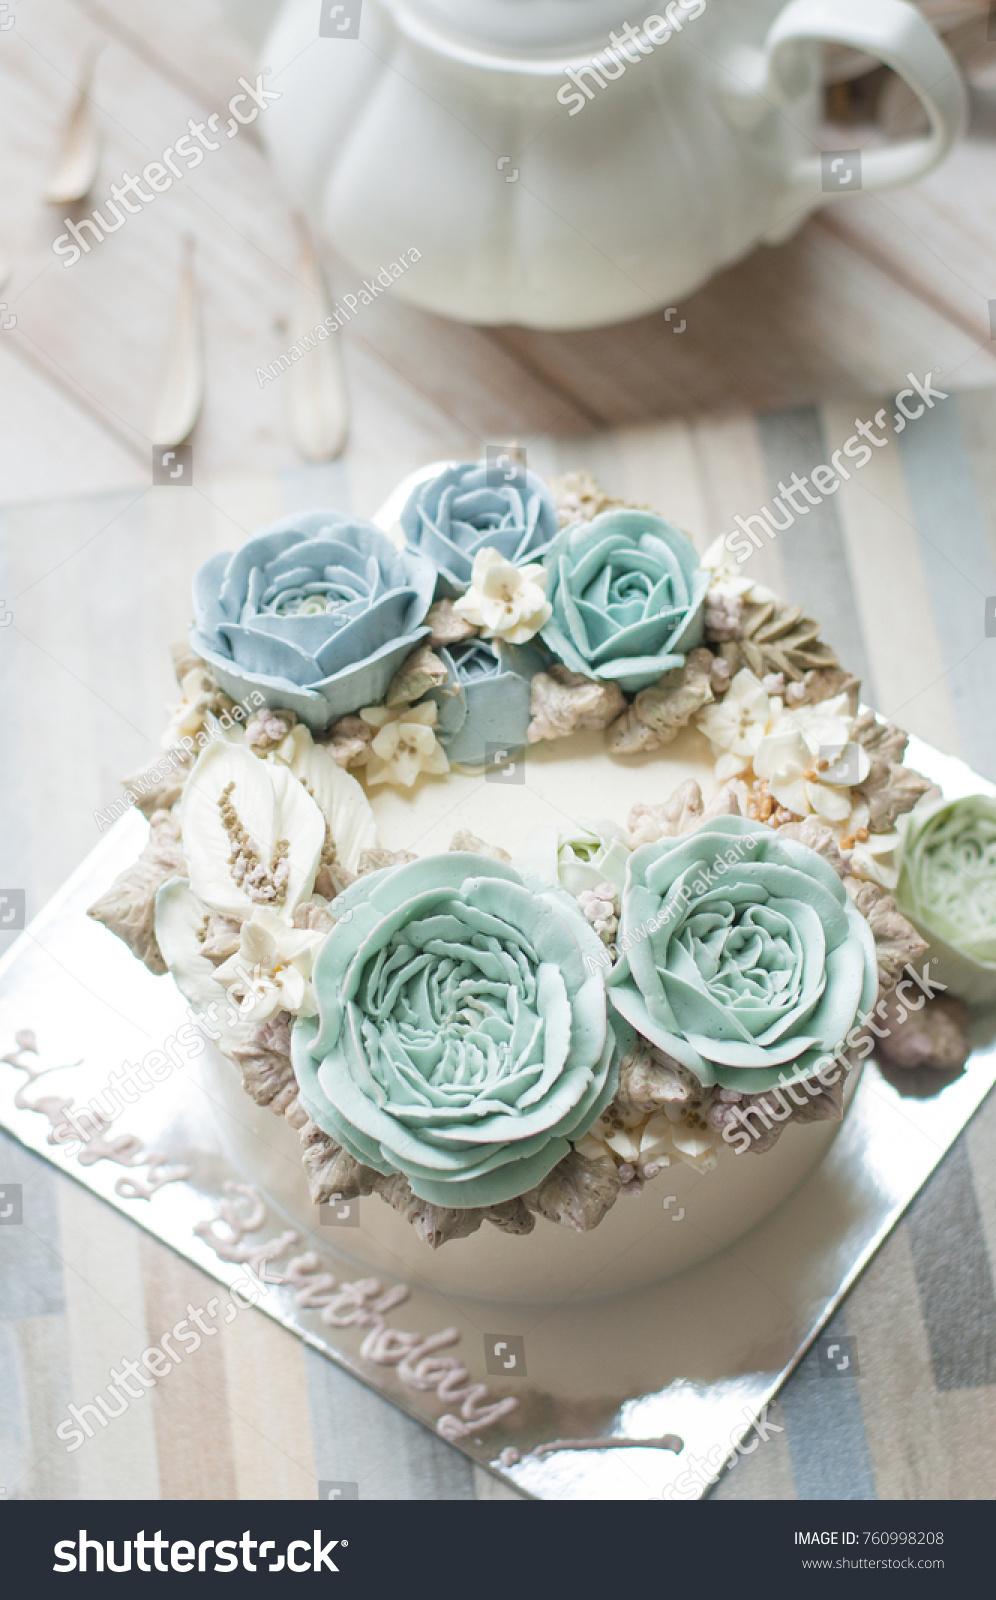 Buttercream Flower Cake Word Happy Birthday Stock Photo (Edit Now ...